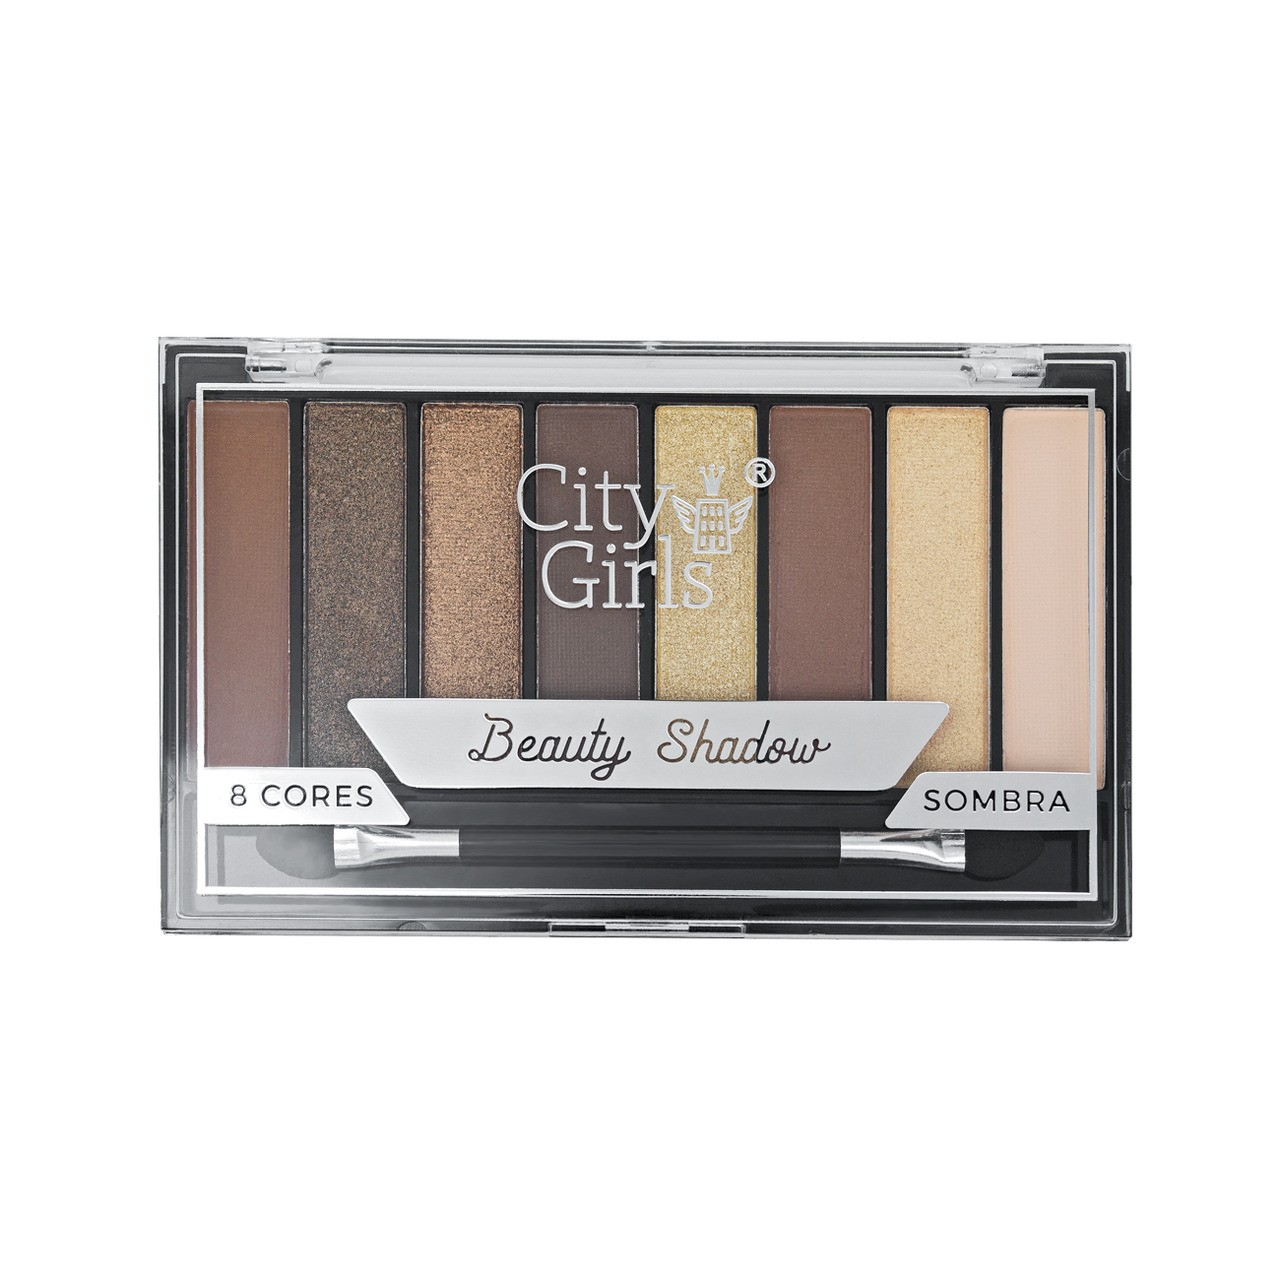 Paleta de Sombras 8 cores City Girls Beauty Shadow